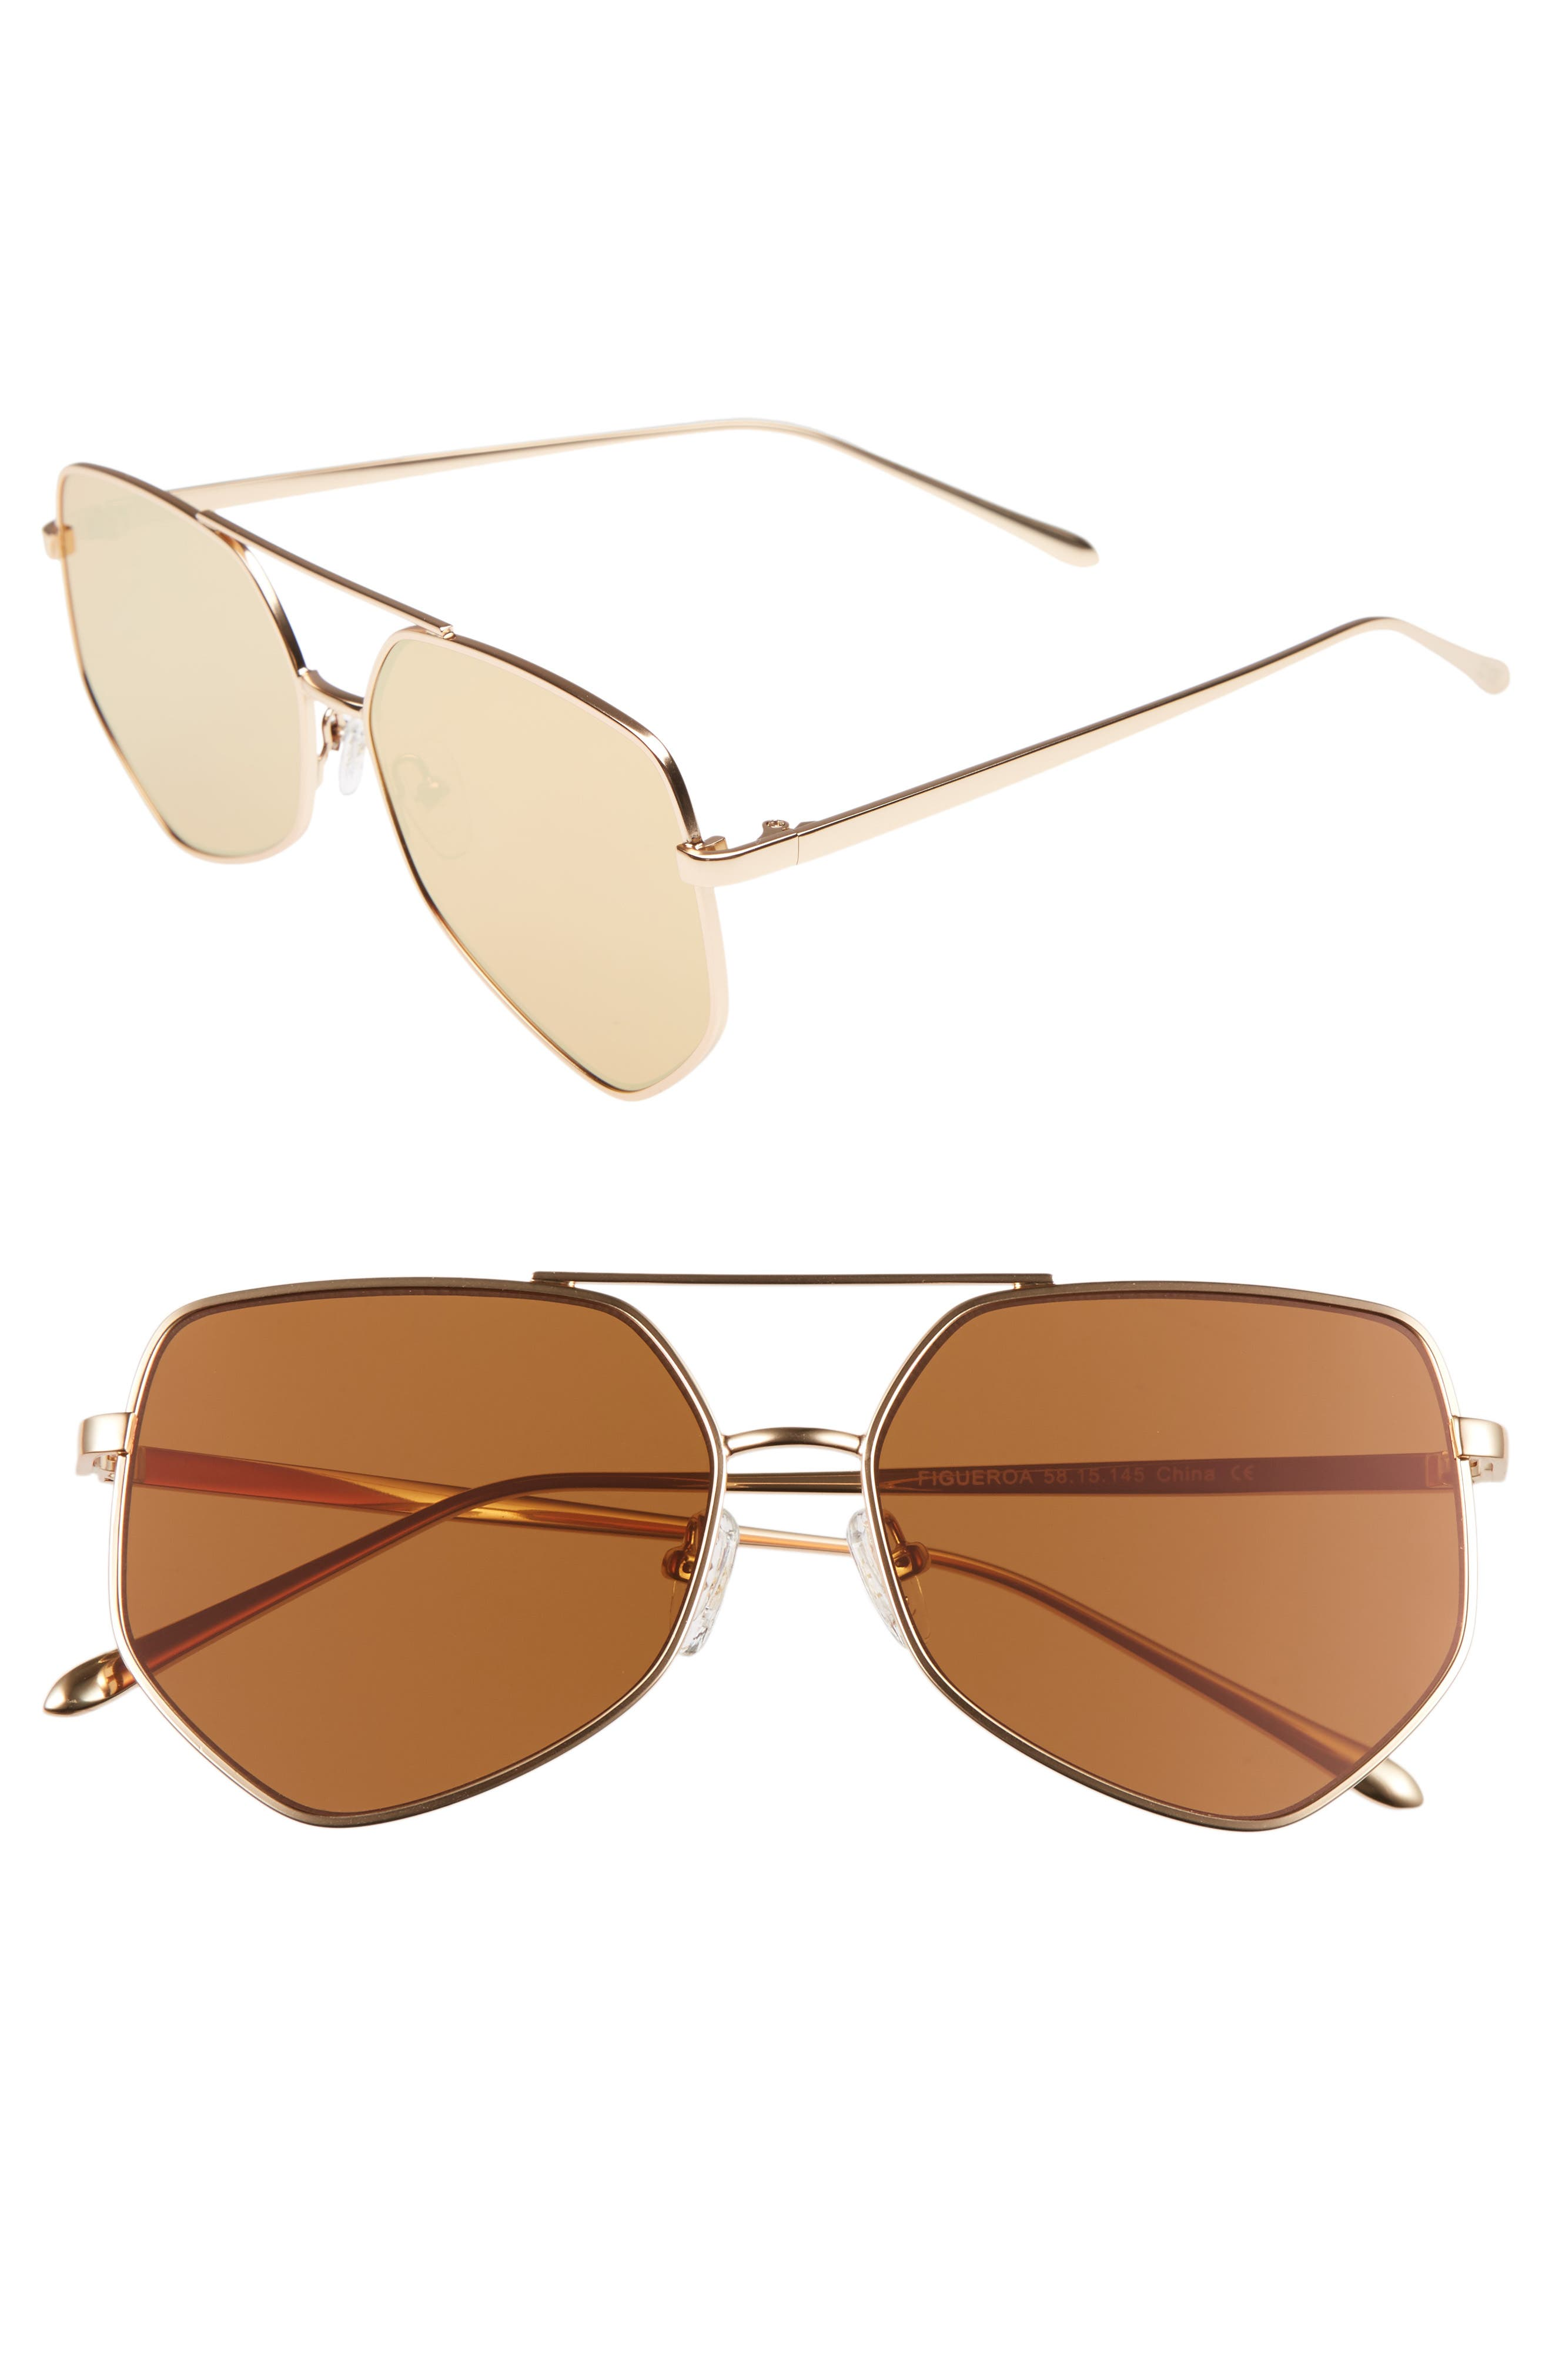 Main Image - Bonnie Clyde Figueroa 58mm Sunglasses